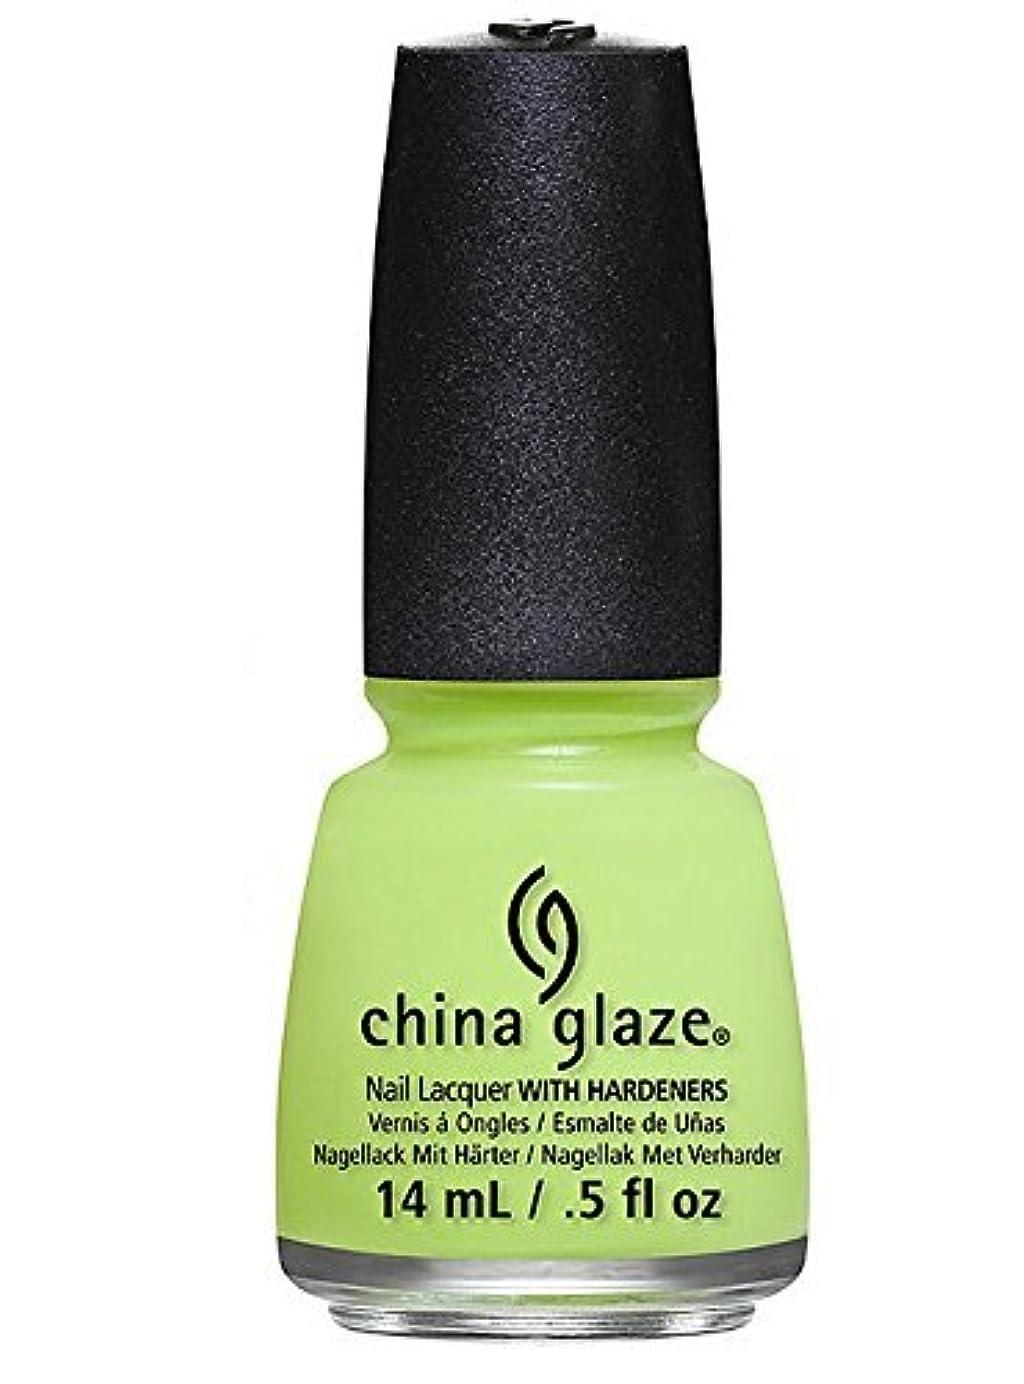 出身地試験経験的China Glaze Avant Garden Collection, Grass is Lime Greener by China Glaze [並行輸入品]